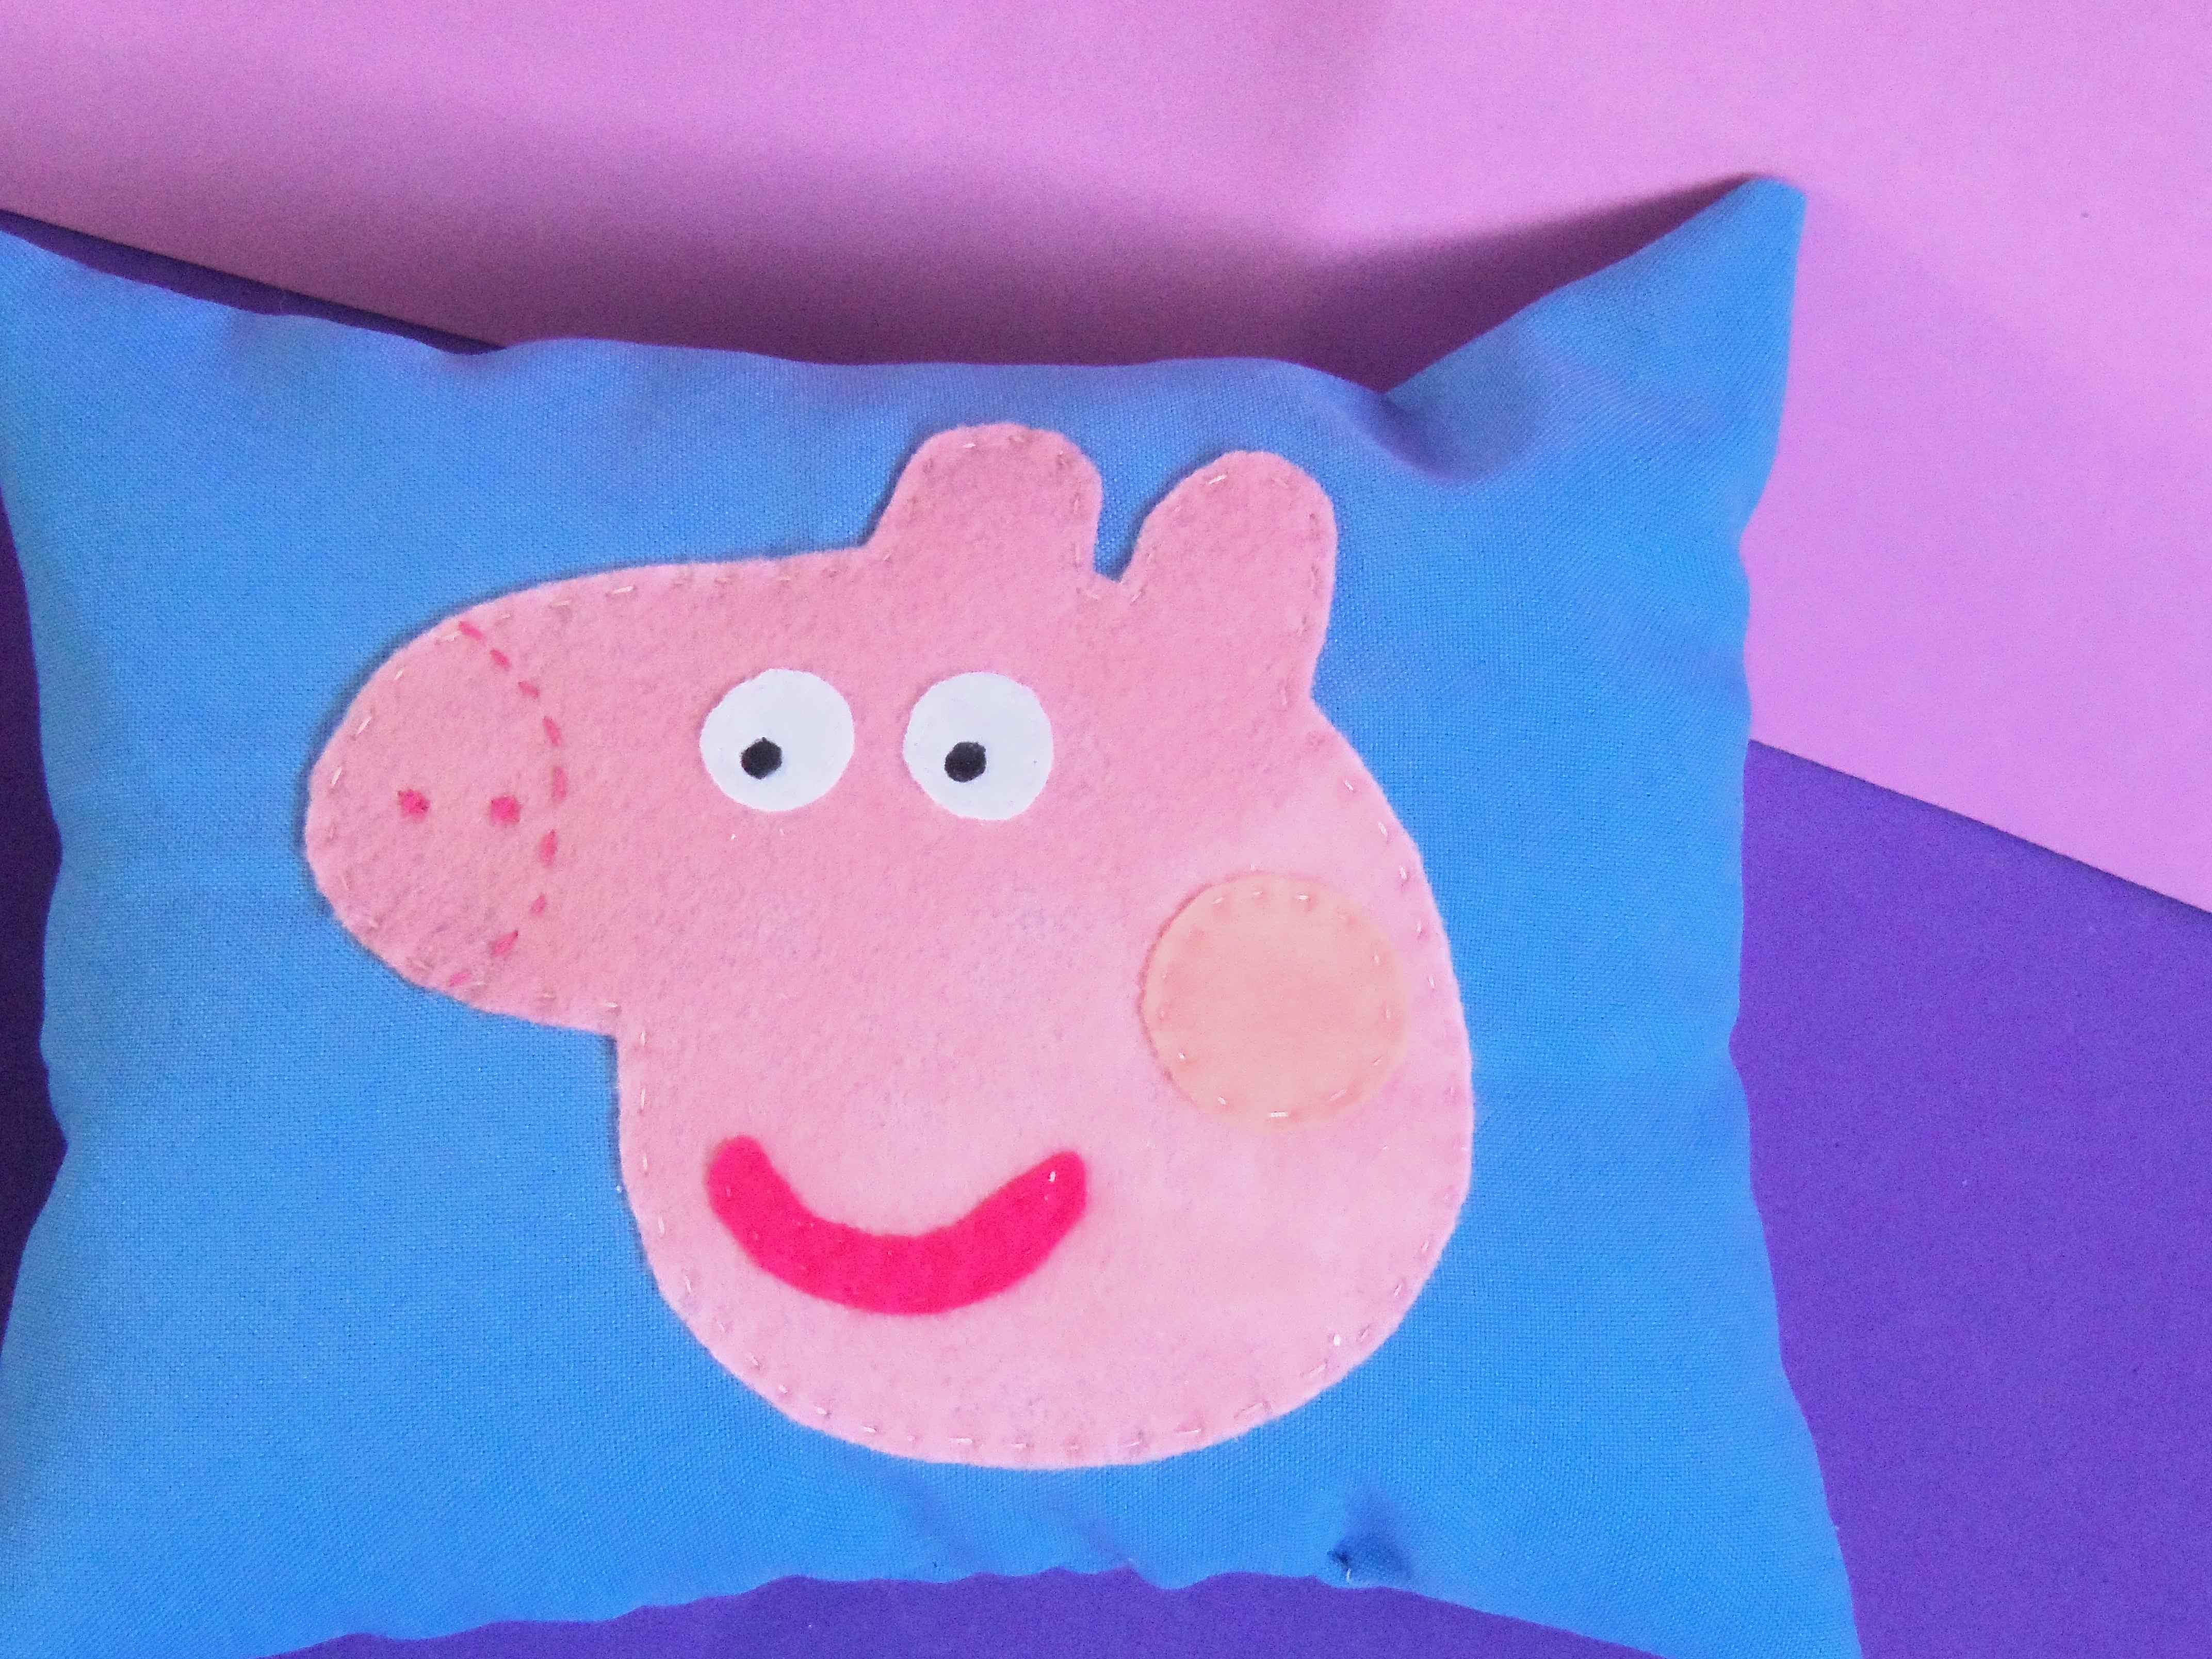 Peppa Pig Almofada Almofada Naninha Da Peppa Pig Peppa Almofada 4288x3216